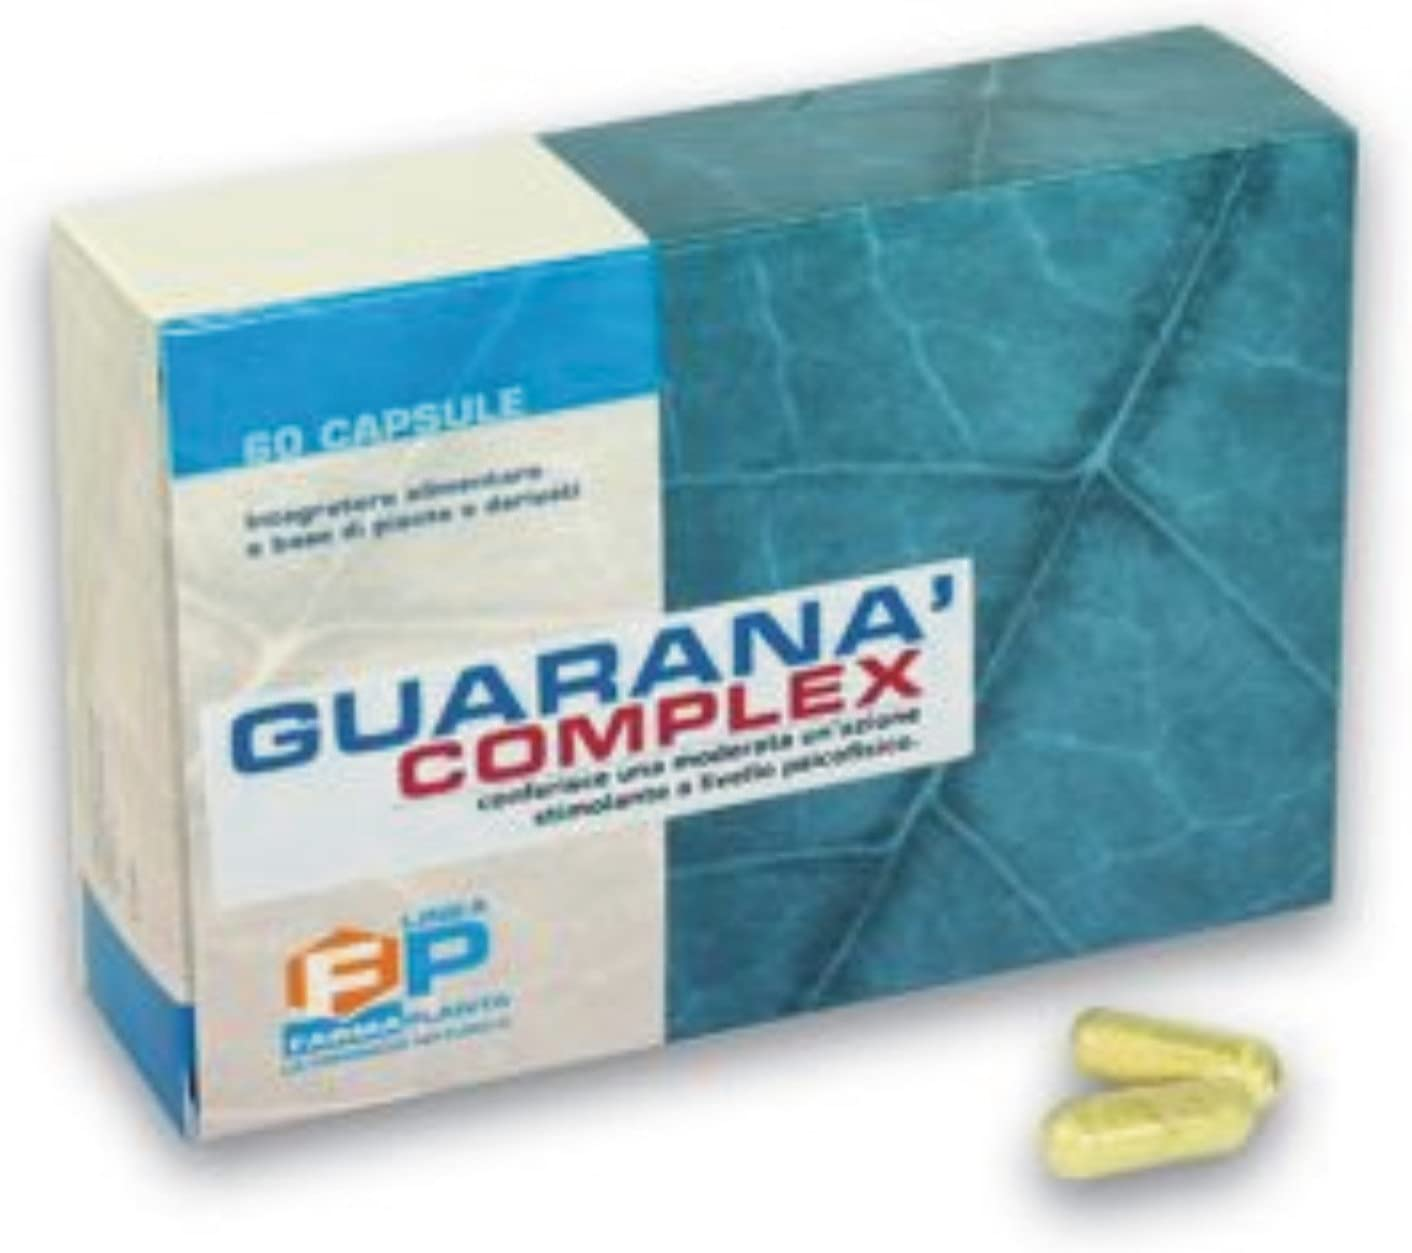 Guarana Complex stimulant energetic 60 CPS Catuaba Suma Muira Puama Ginseng